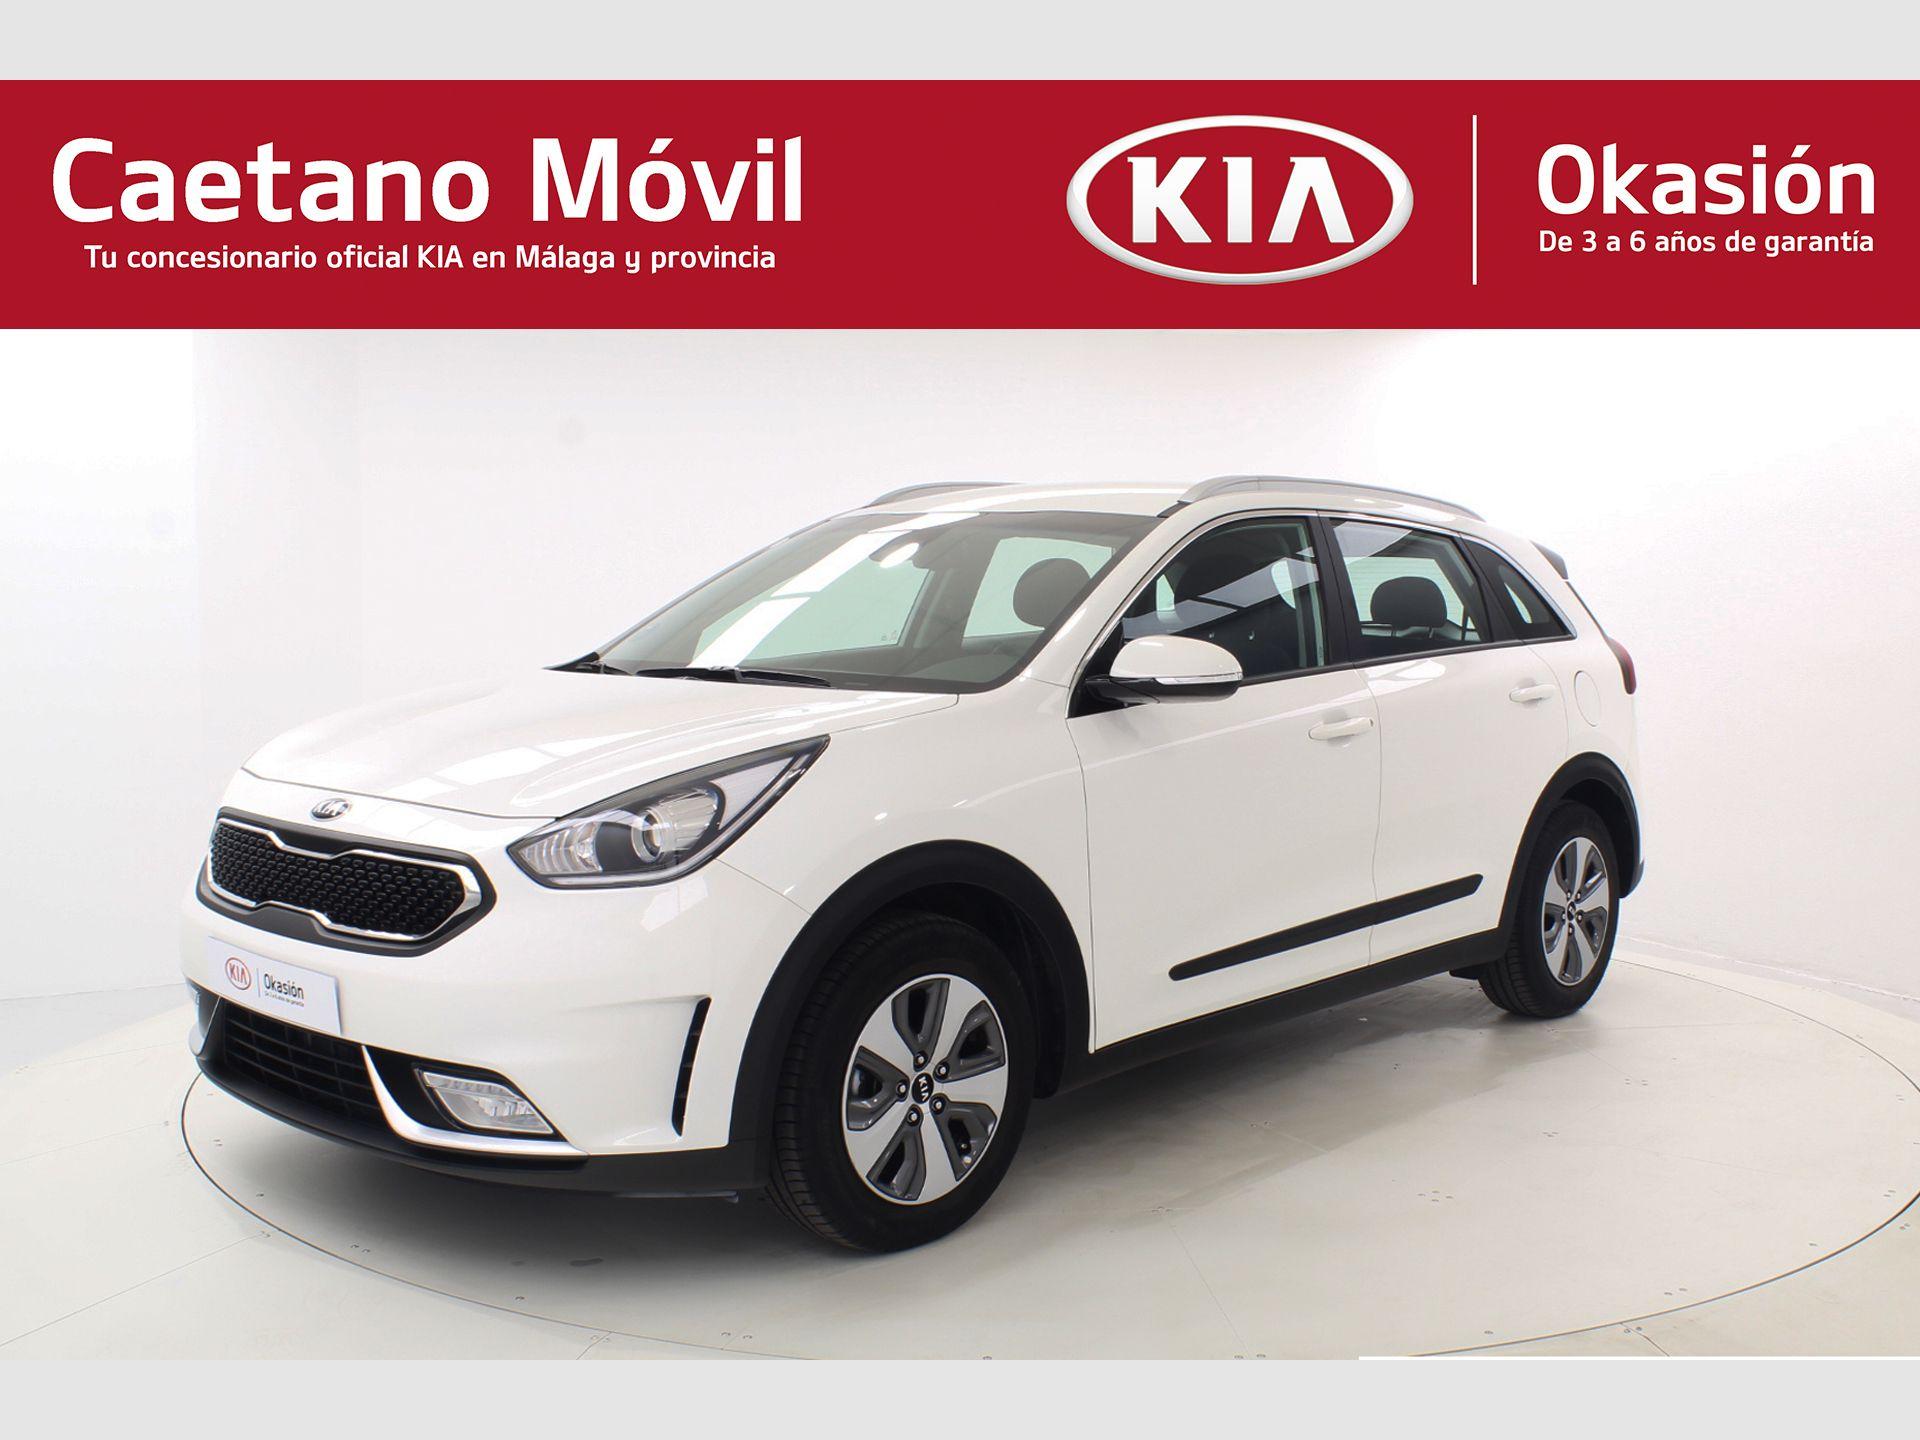 Kia Niro 1.6 GDi HEV 104kW (141CV) Drive segunda mano Málaga